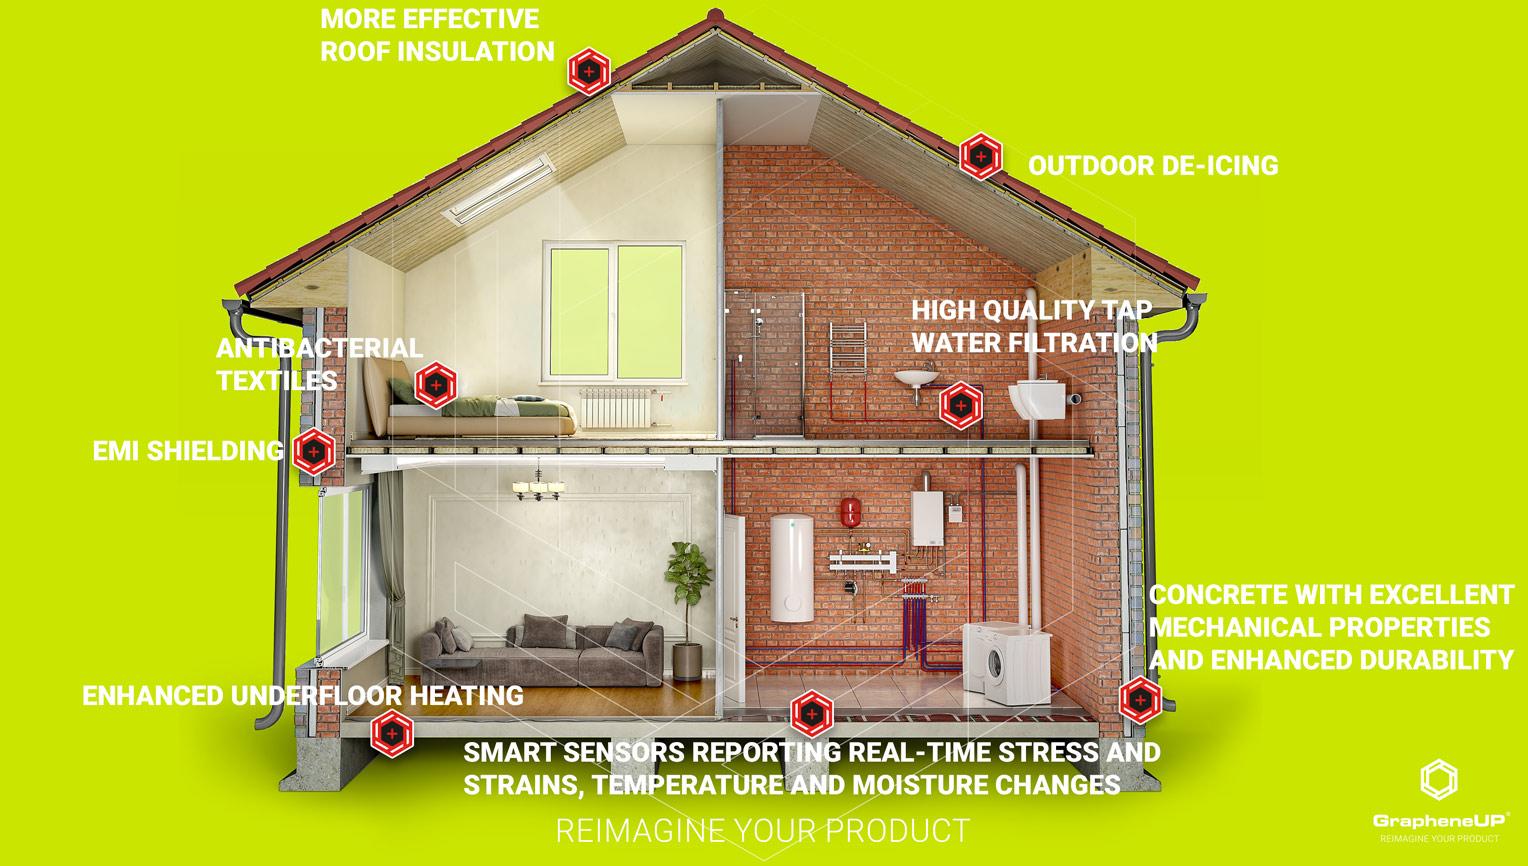 graphene enhanced product house